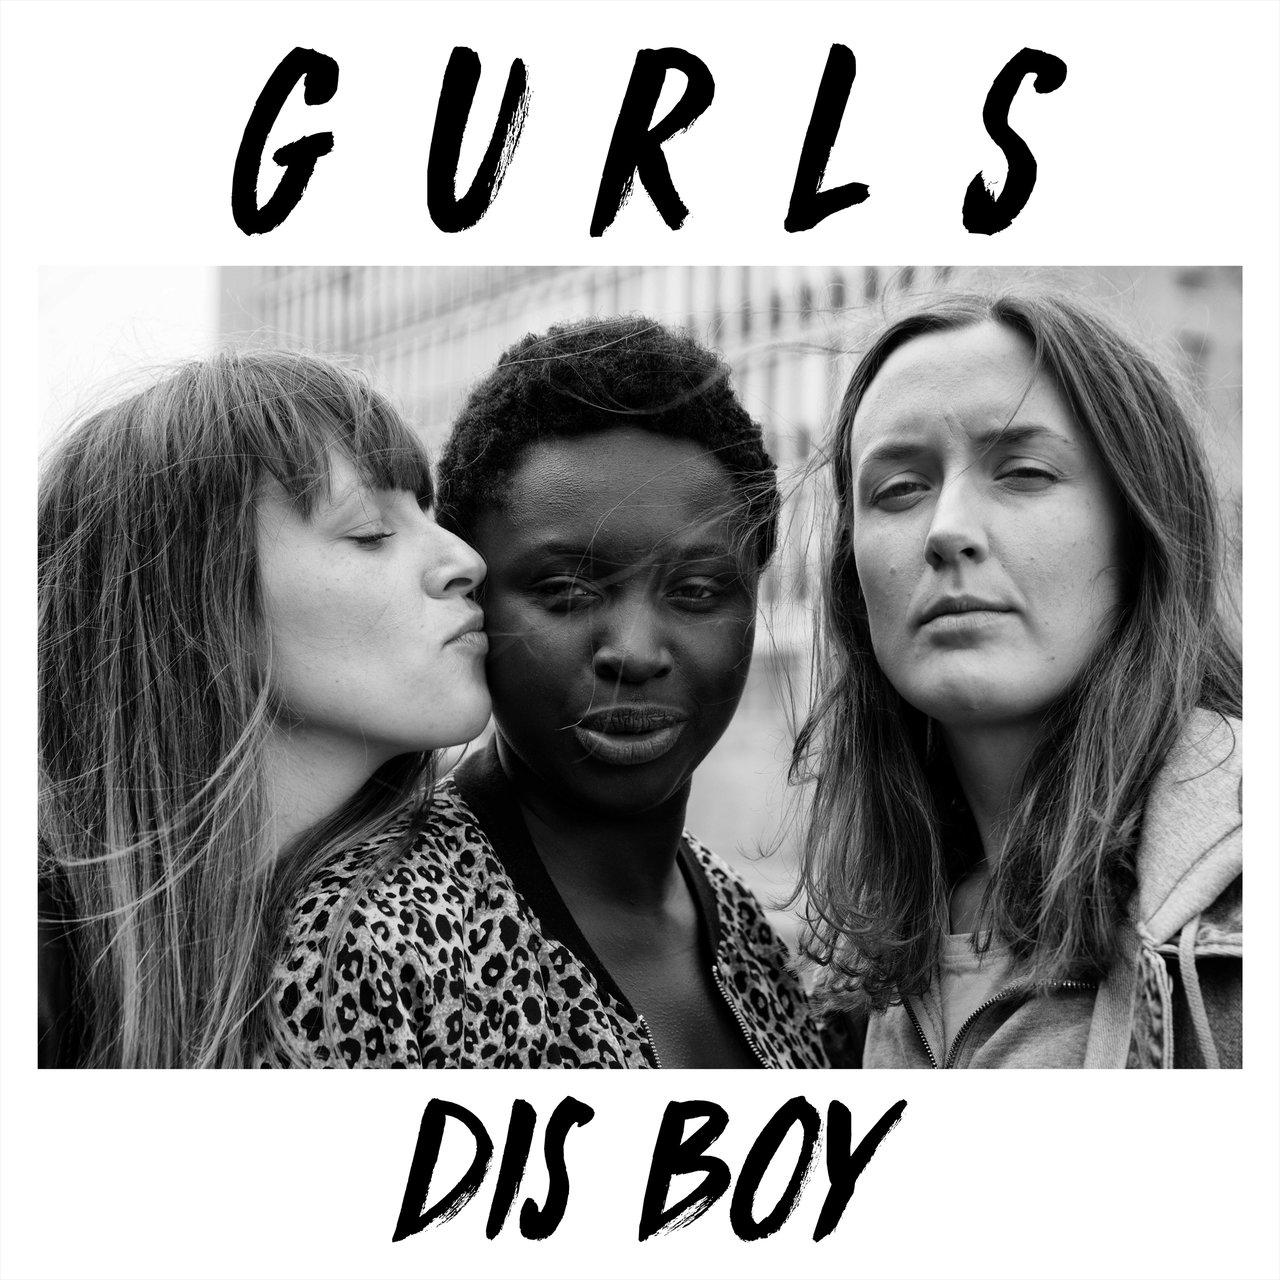 gurls-dis boy.jpg